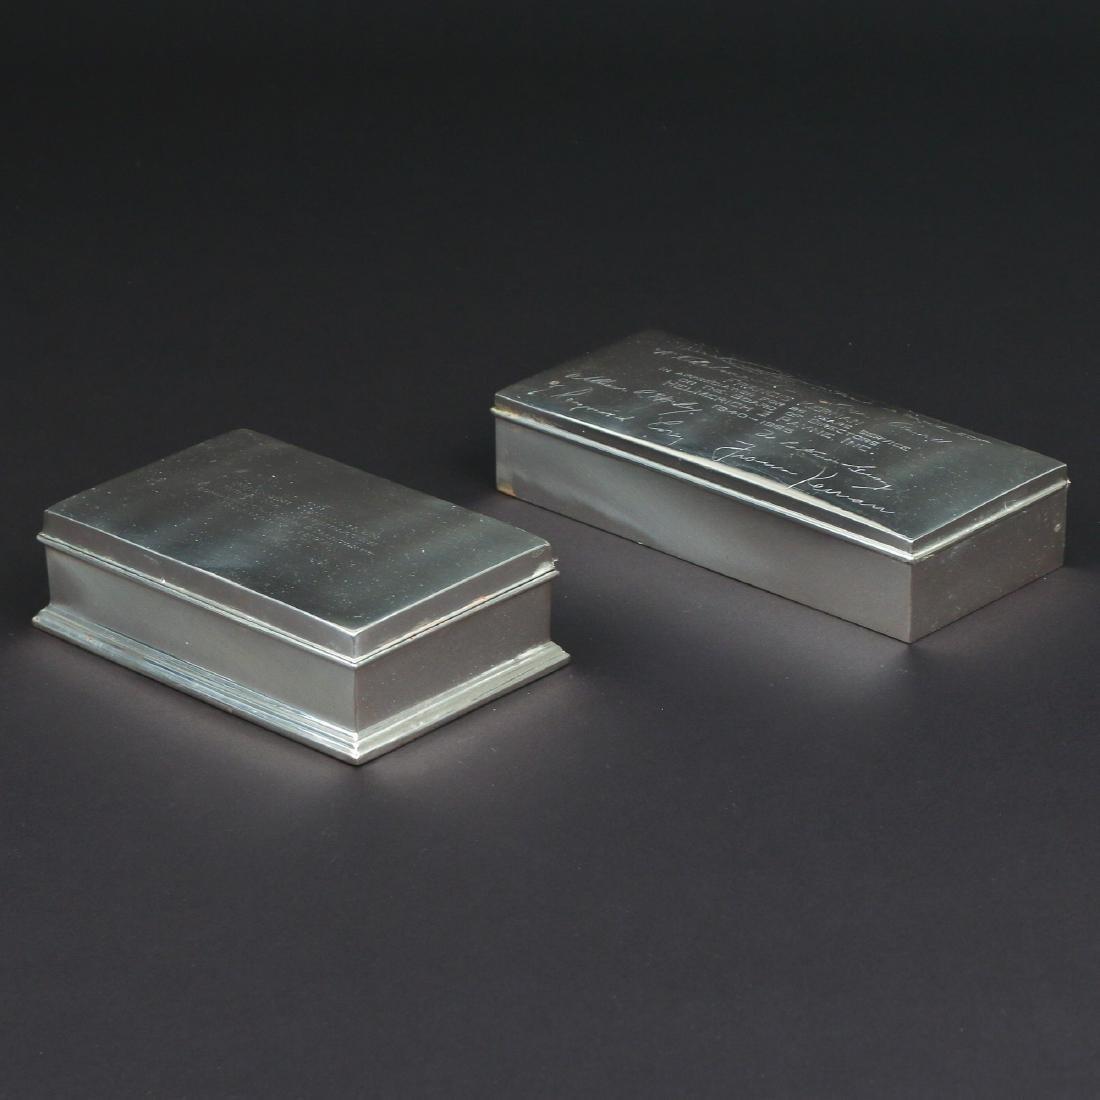 (2pc) STERLING SILVER CIGARETTE BOXES